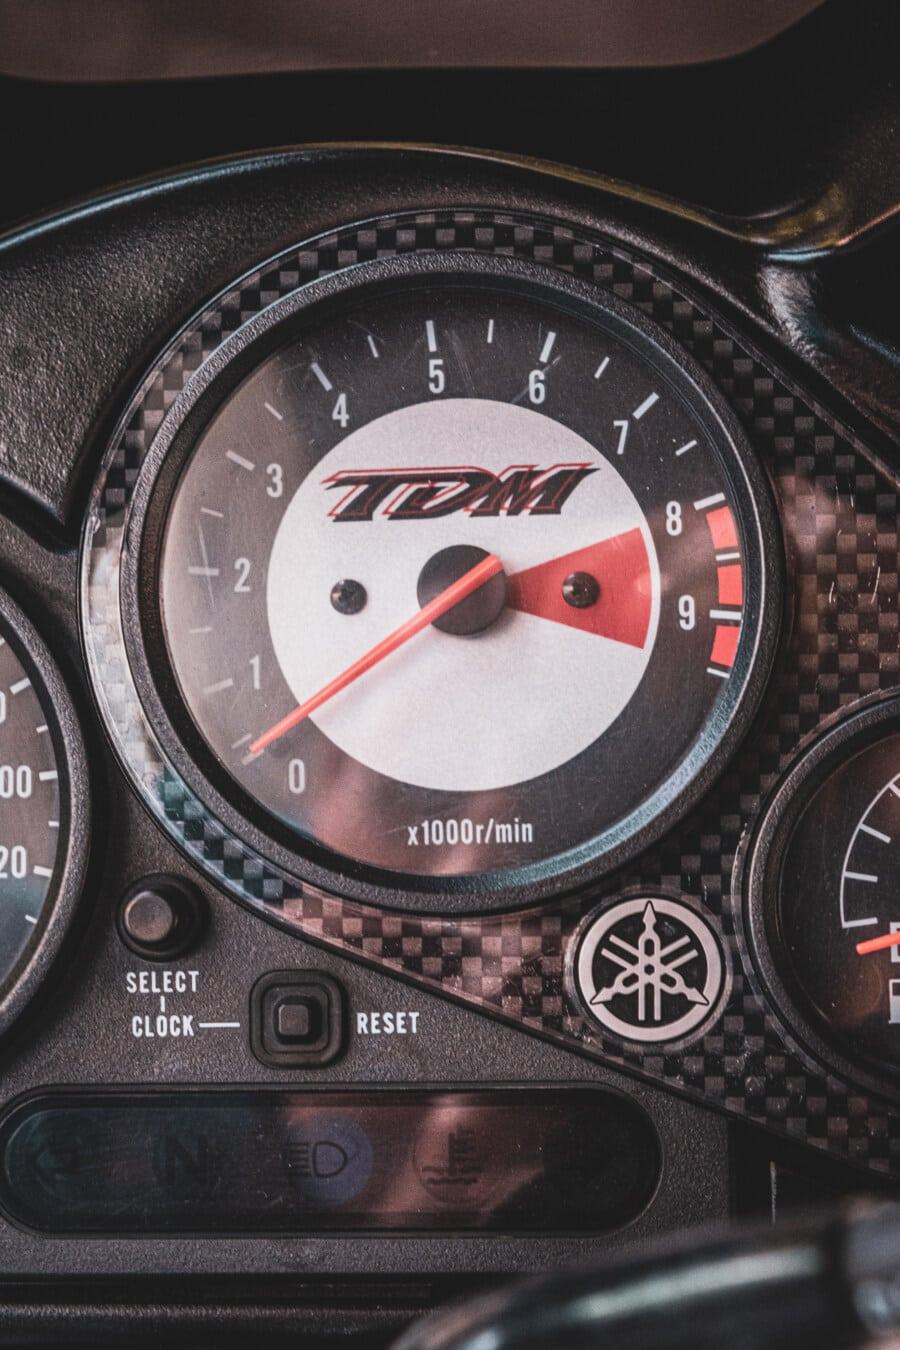 Tachometer, Motorrad, Gangschaltung, Control-panel, Dashboard, Fahrzeug, Instrument, Messgerät, Control, Geschwindigkeit